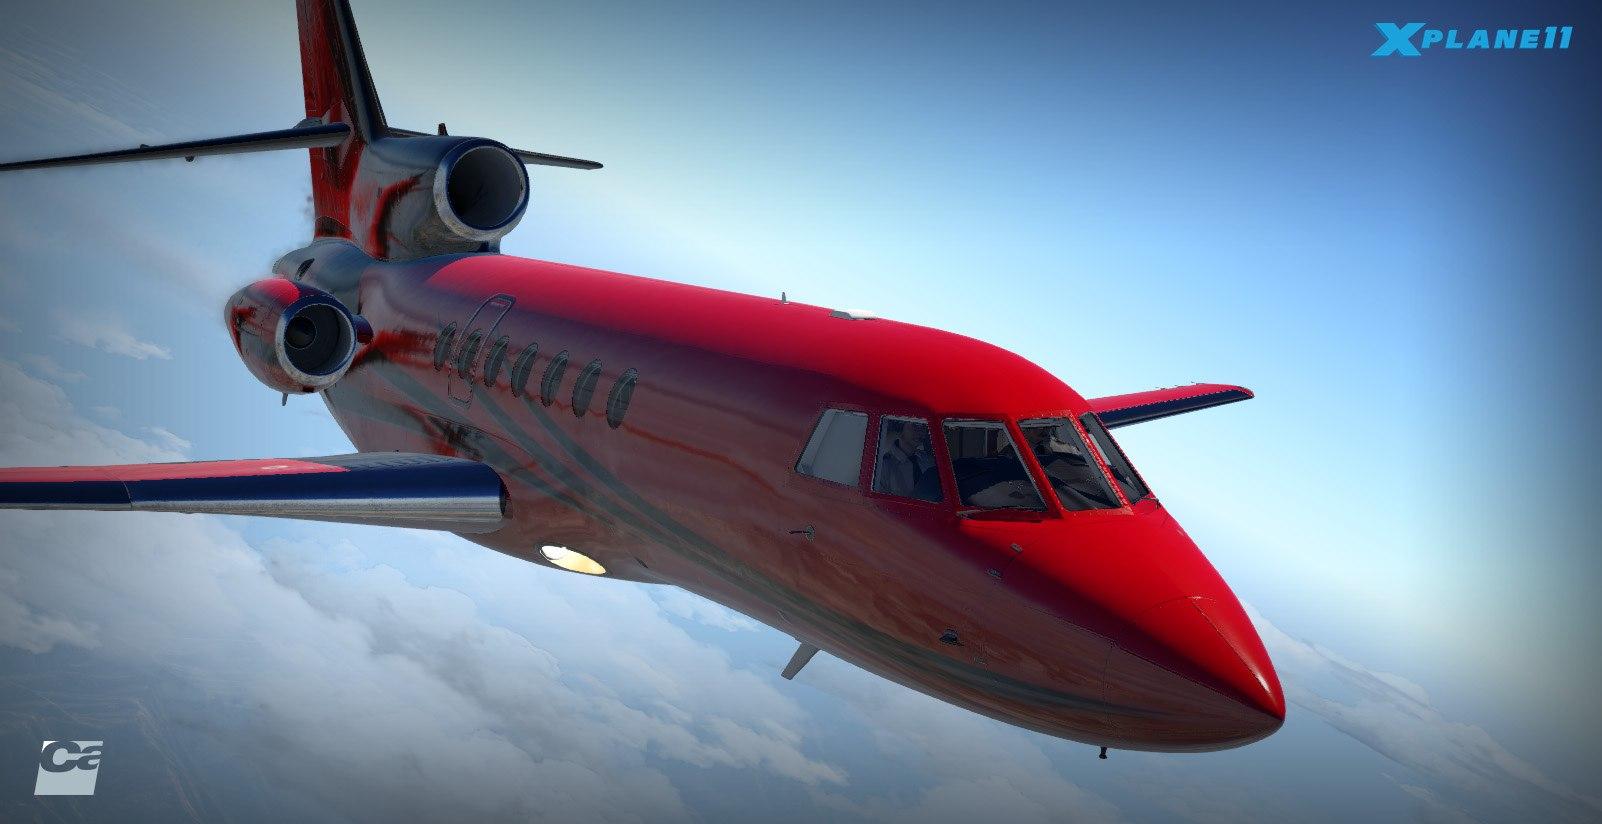 Carenado Announces Dassault Falcon 50 + Hints at ATR for X